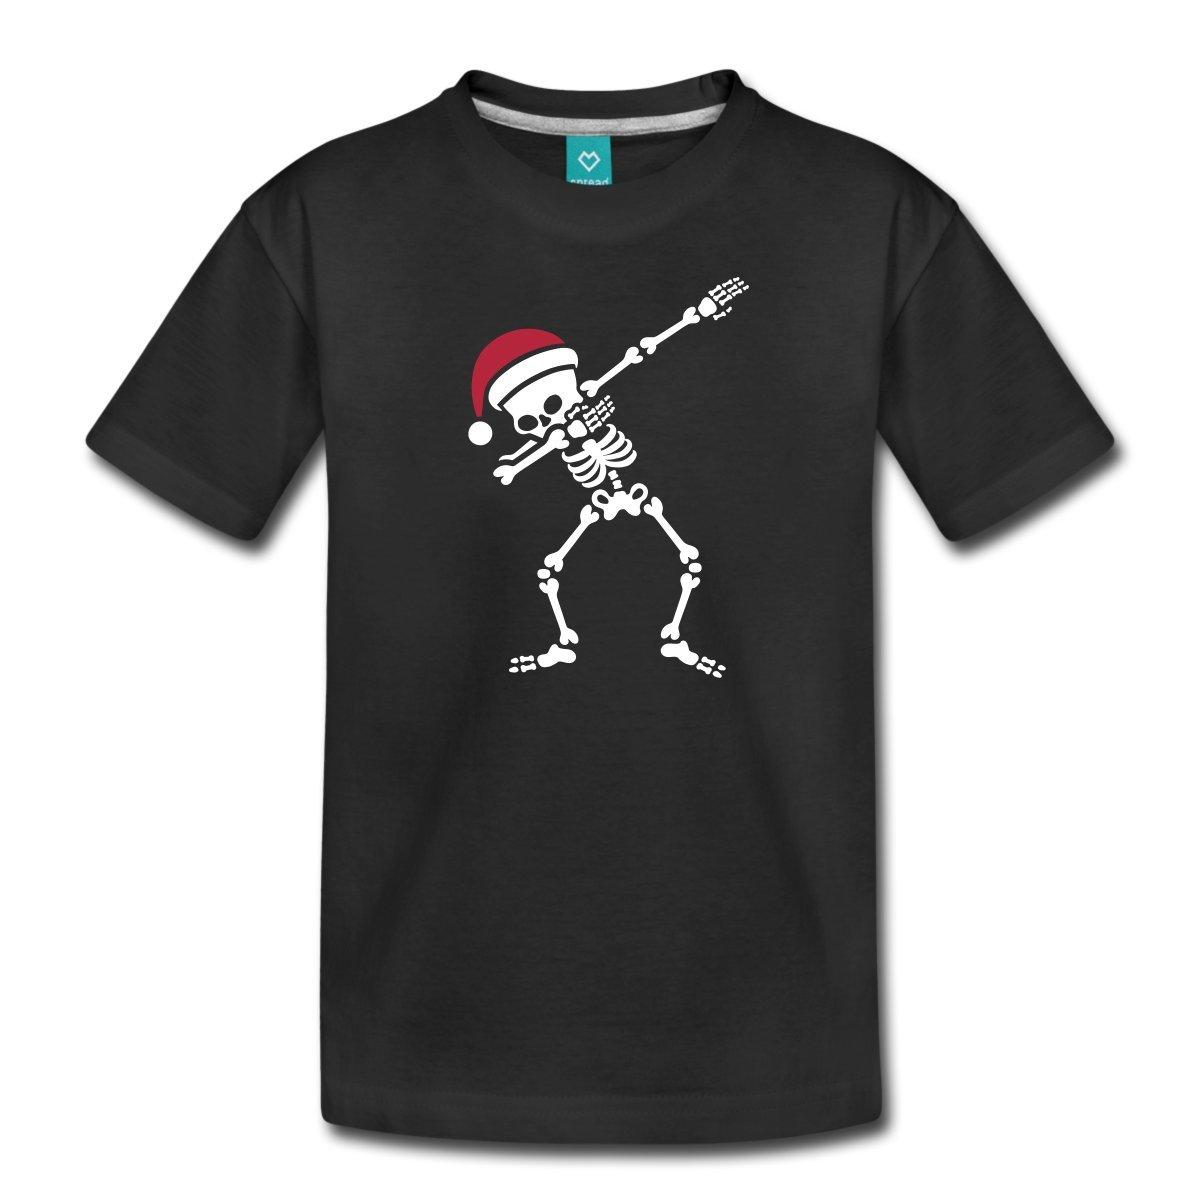 Spreadshirt Funny Dabbing Christmas Skeleton Teenage T-Shirt S205909-A113013288-1